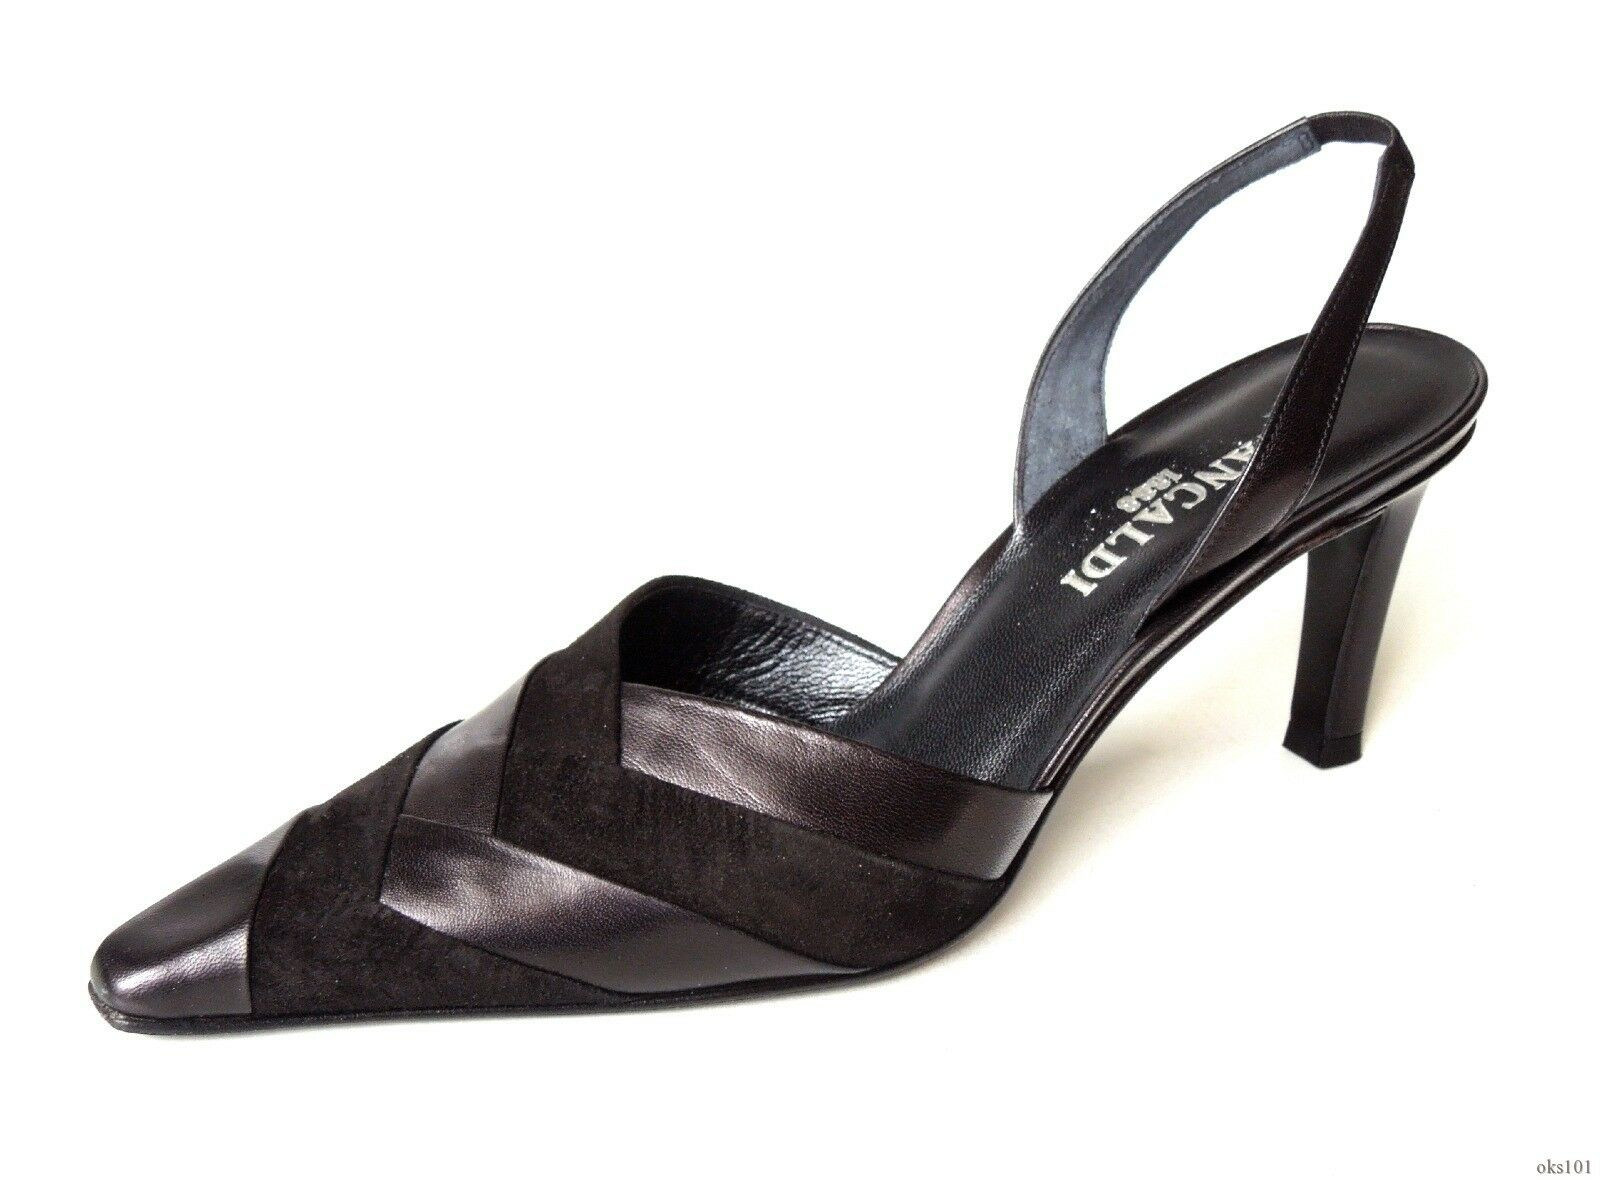 New PANCALDI FR173 black leather suede slingback slingback slingback heels shoes  7 - DRESSY 83610b